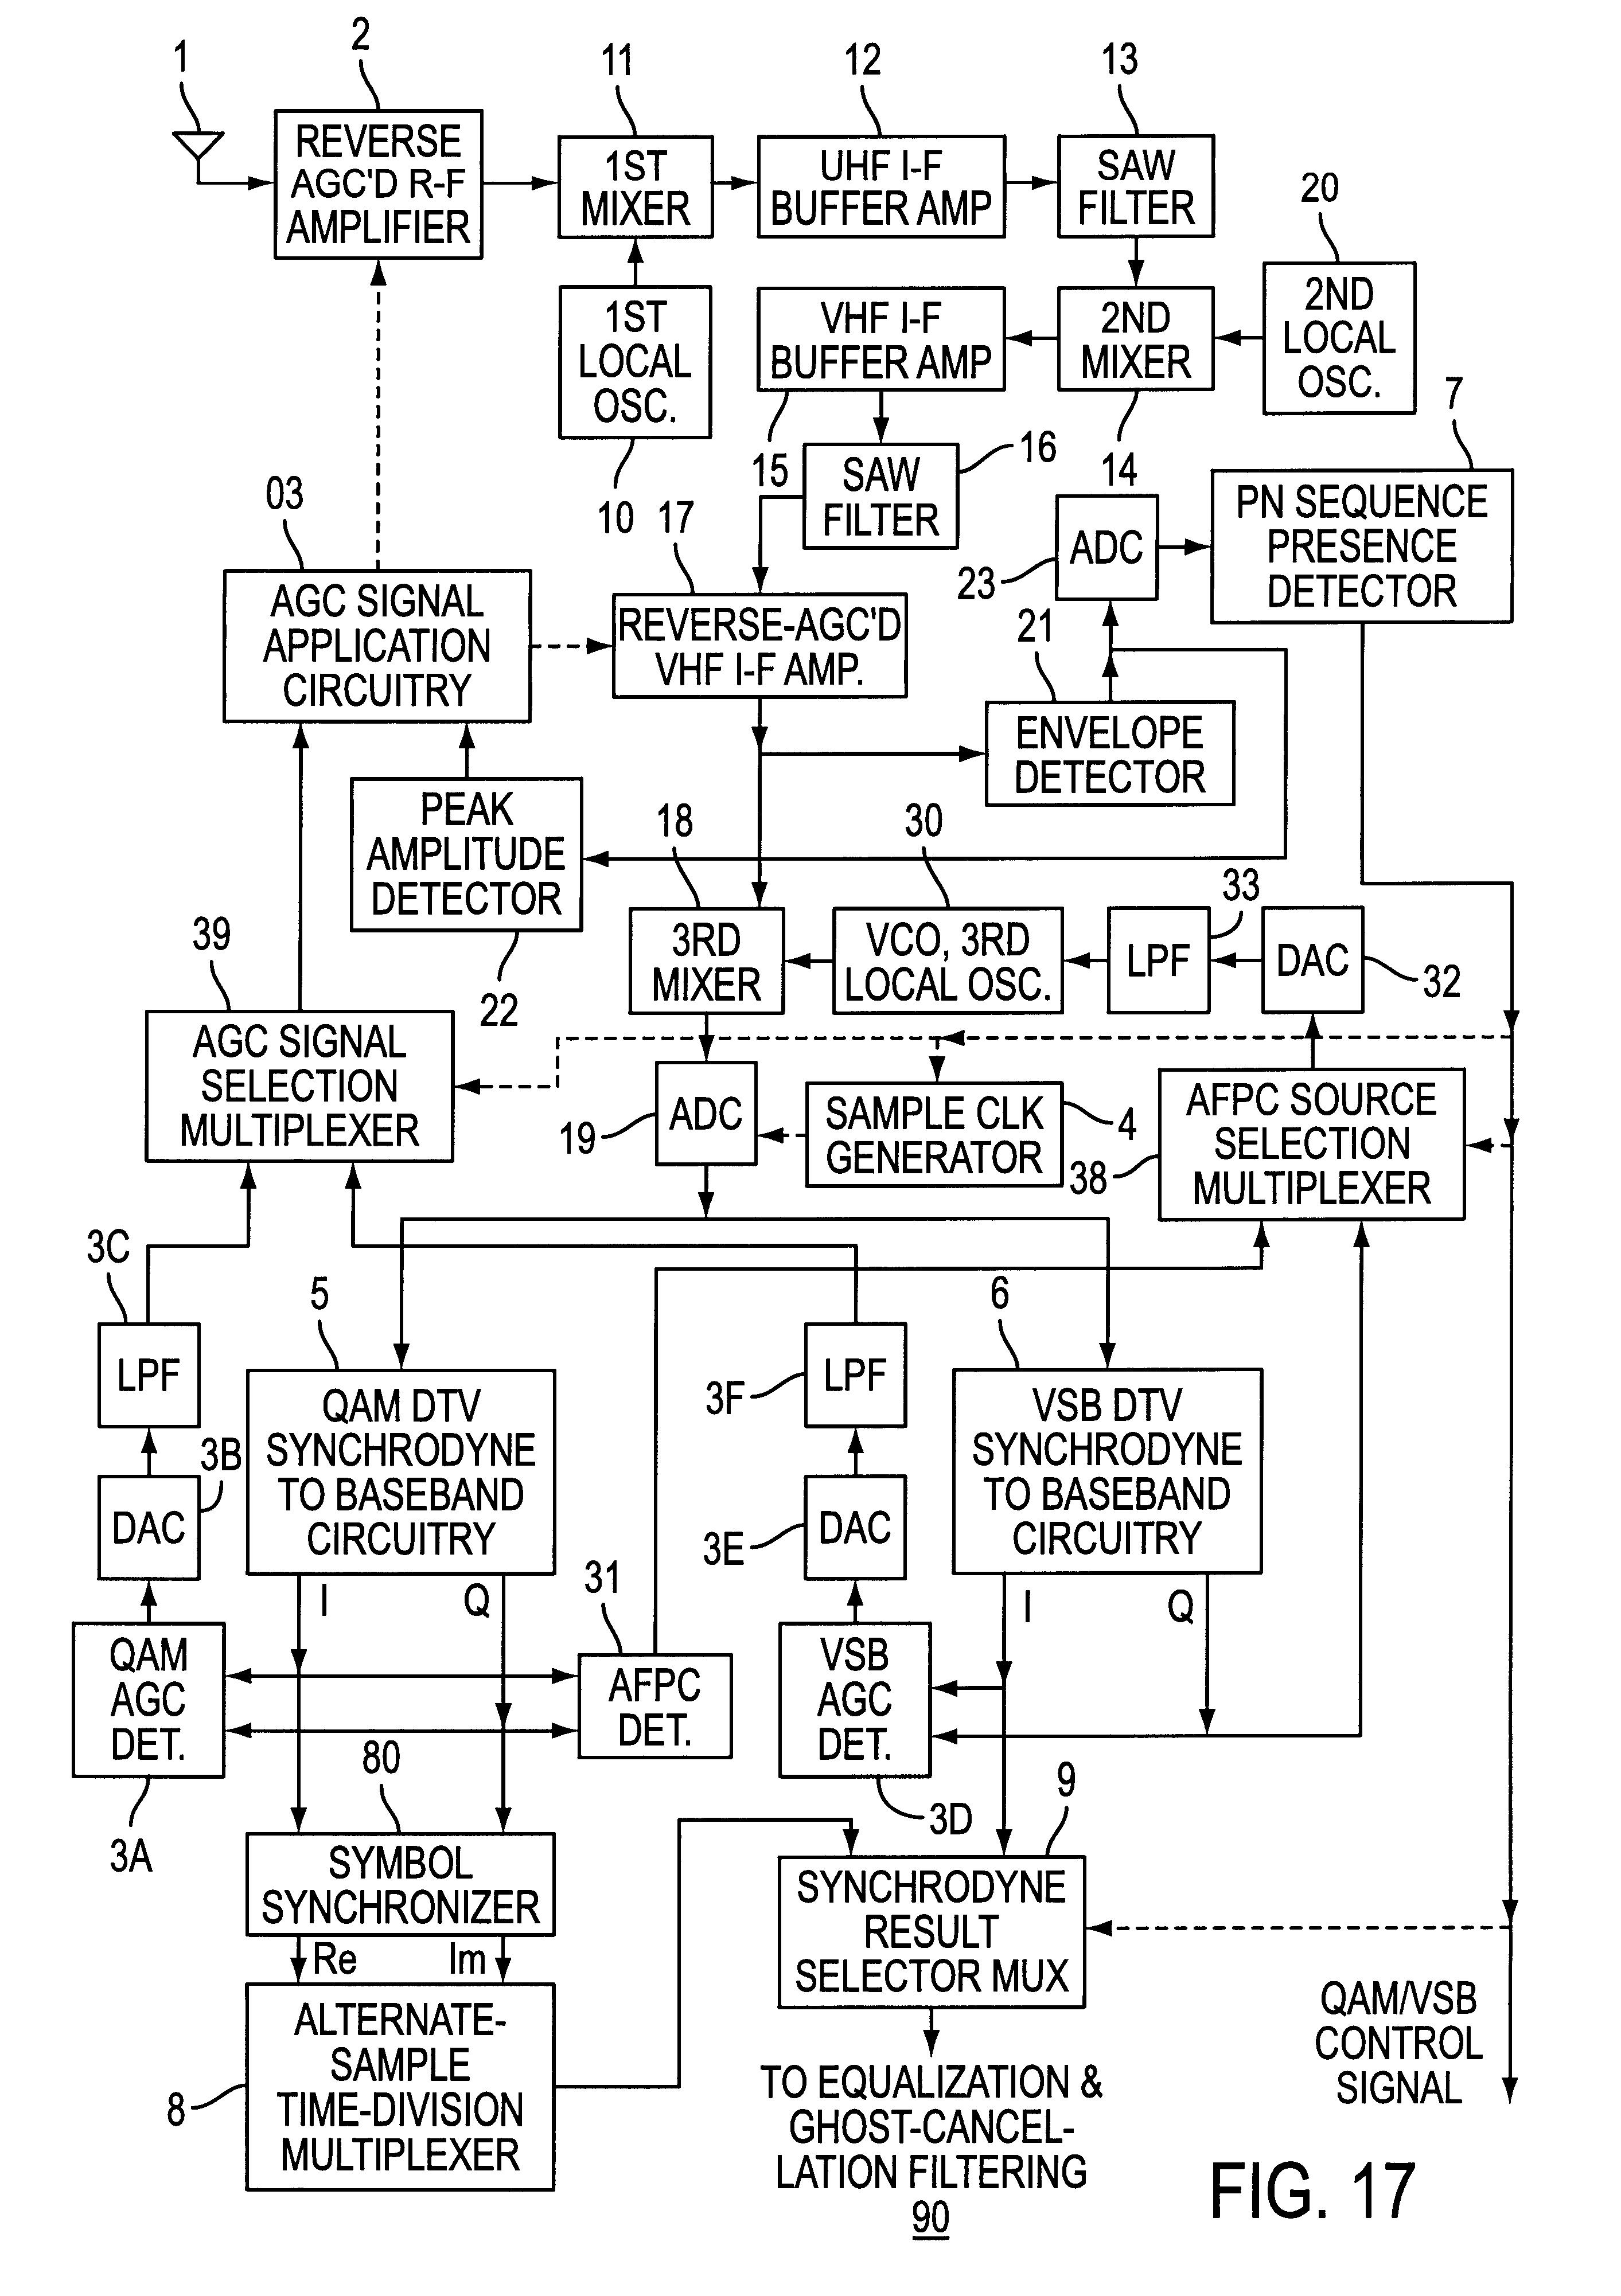 Patent Us6480236 Envelope Detection Of Pn Sequences Accompanying Sensitive Detector Circuit Diagram Drawing